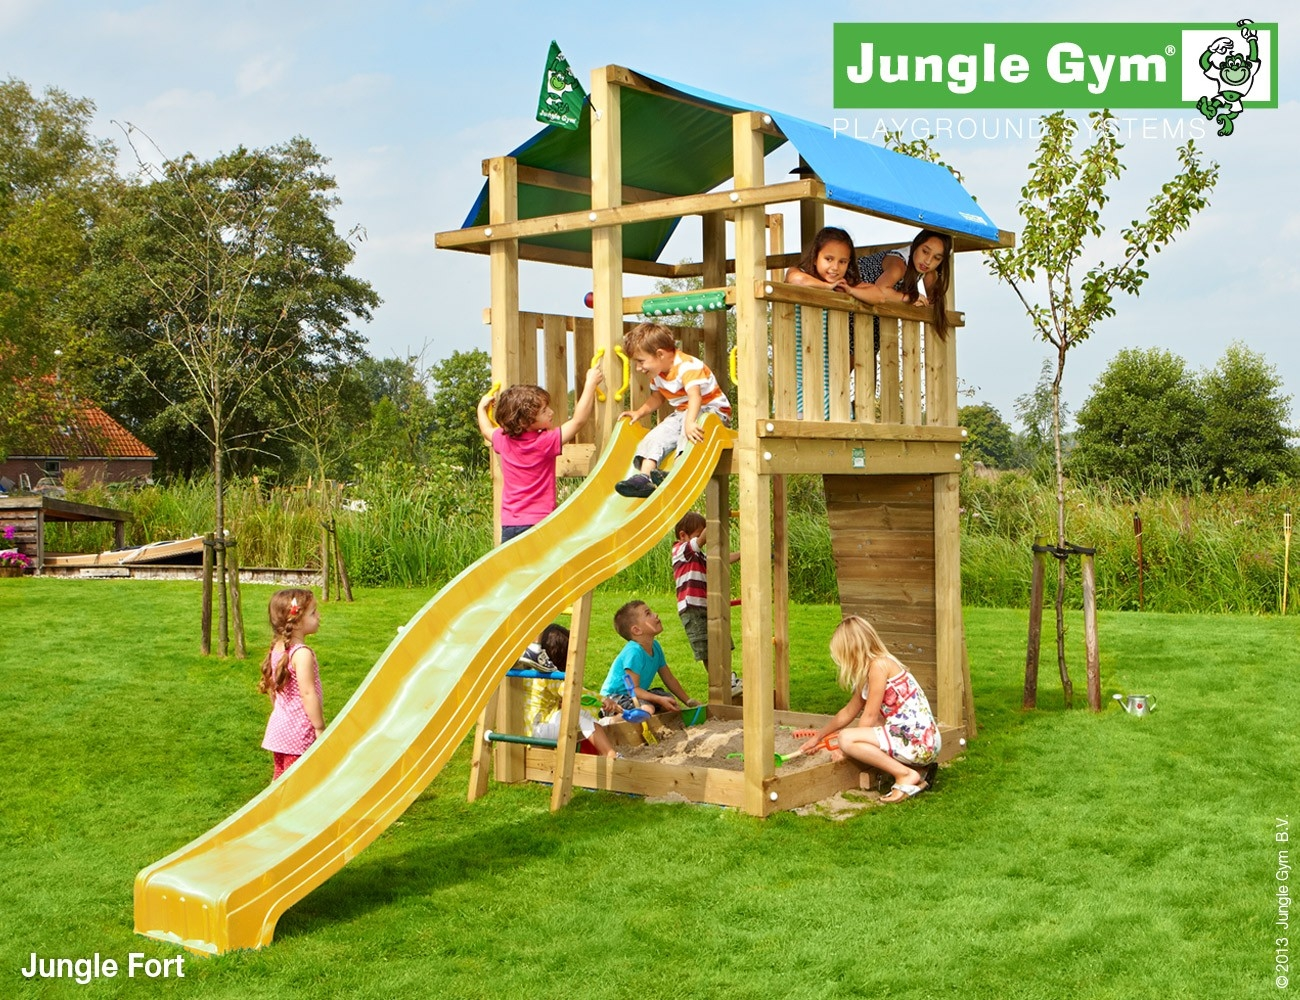 Jungle Gym   Fort   Appelgroen